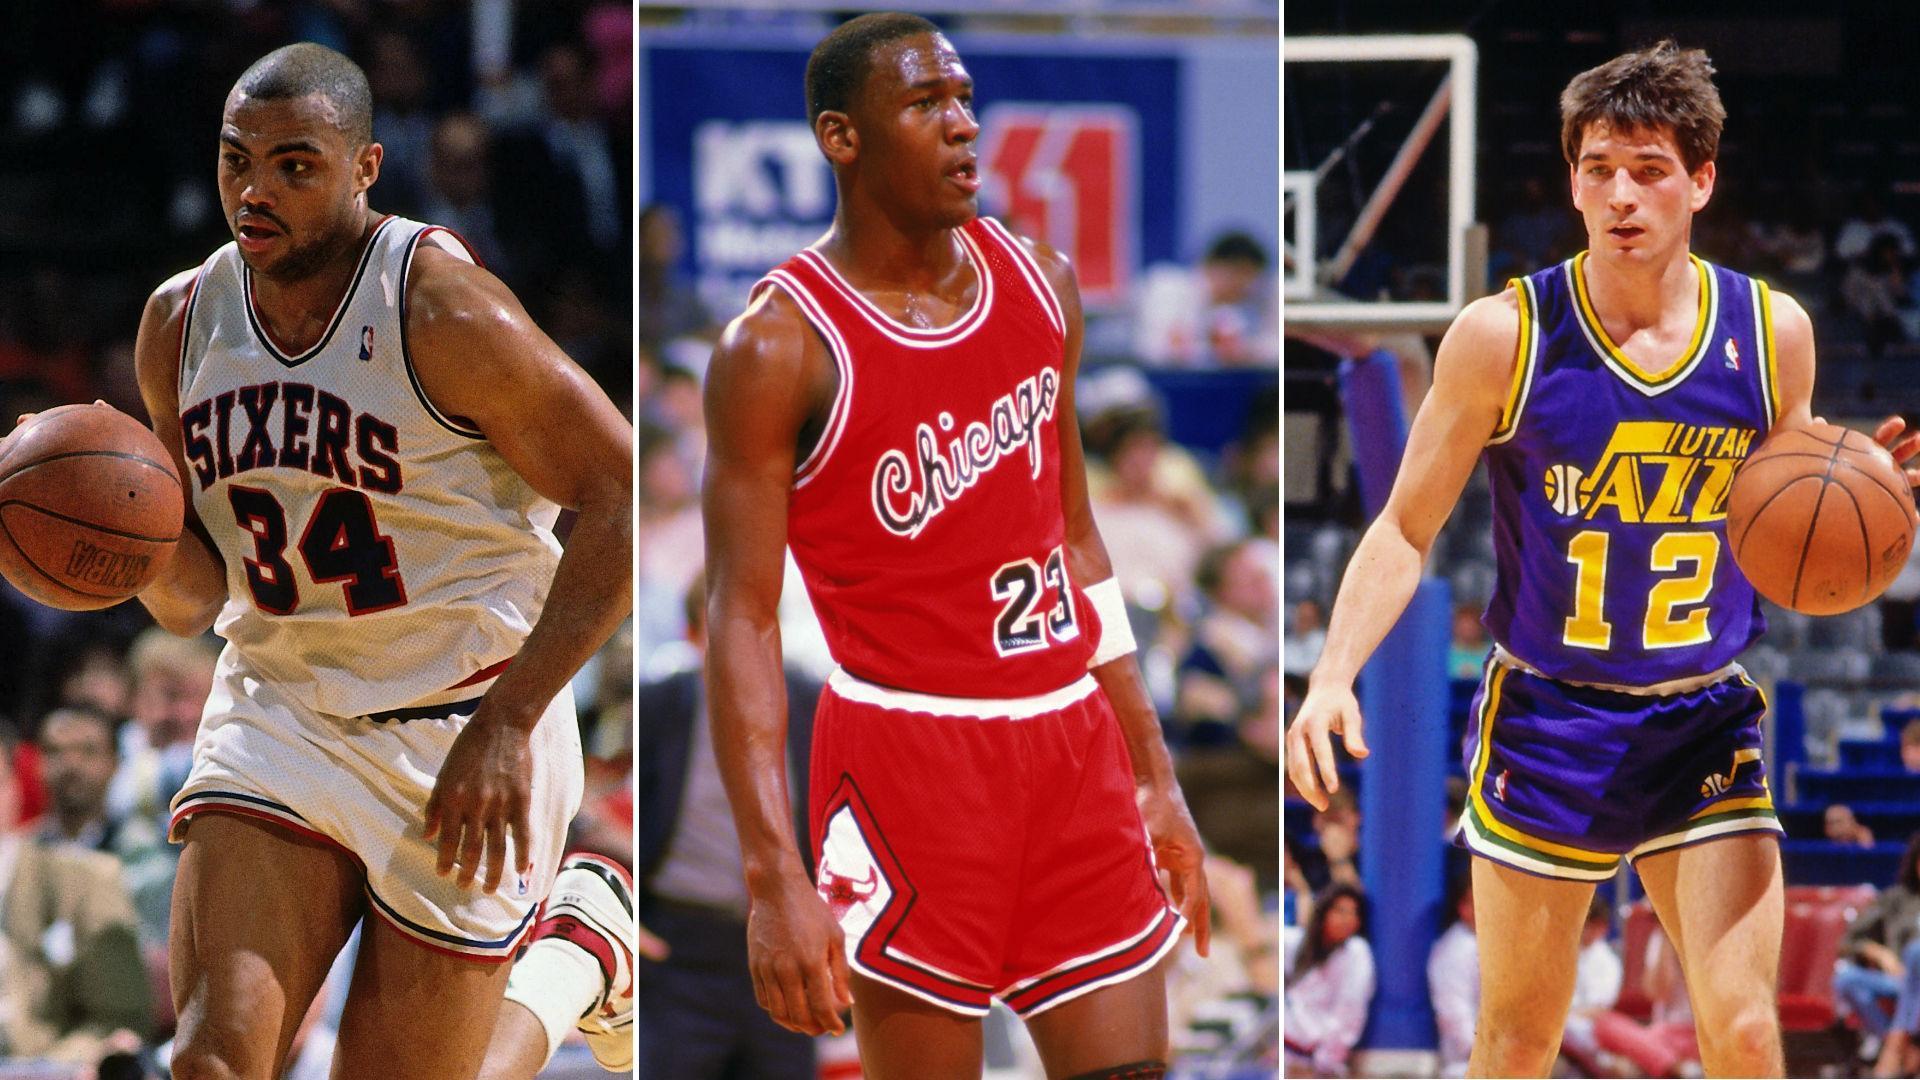 Legendary Moments In NBA History: Jordan, Barkley, Stockton debut in 1984